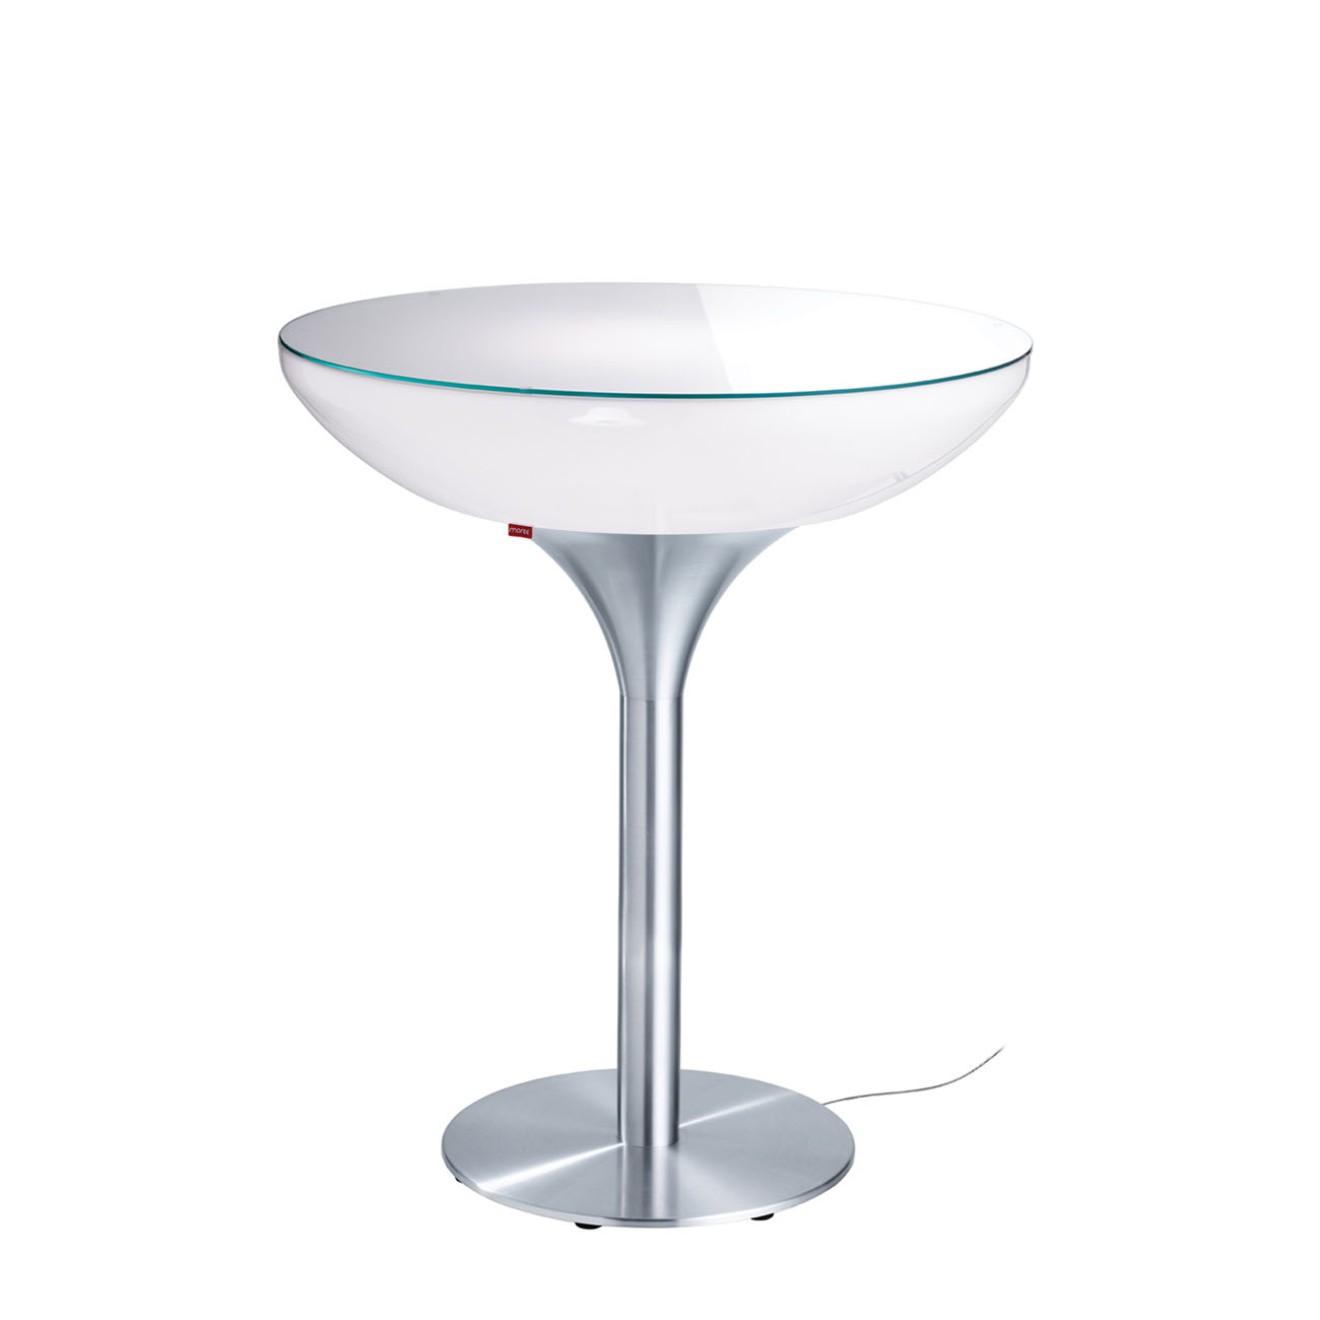 loungetisch lounge h 105 home light exklusives. Black Bedroom Furniture Sets. Home Design Ideas